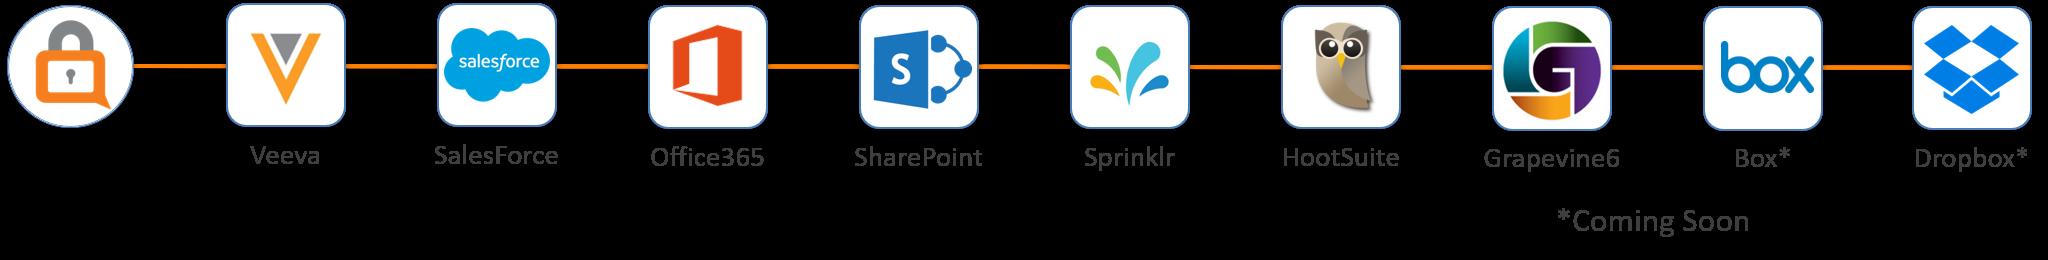 SafeGuard Cyber Enterprise App Channels